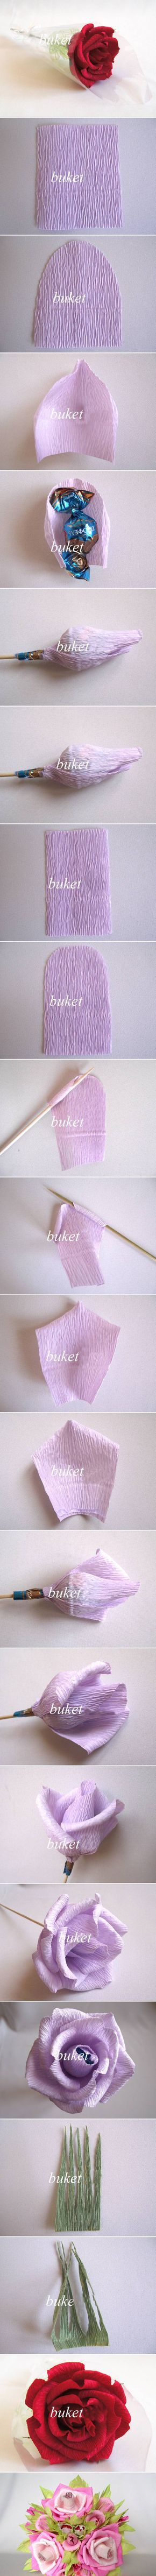 Bloem van crepe papier